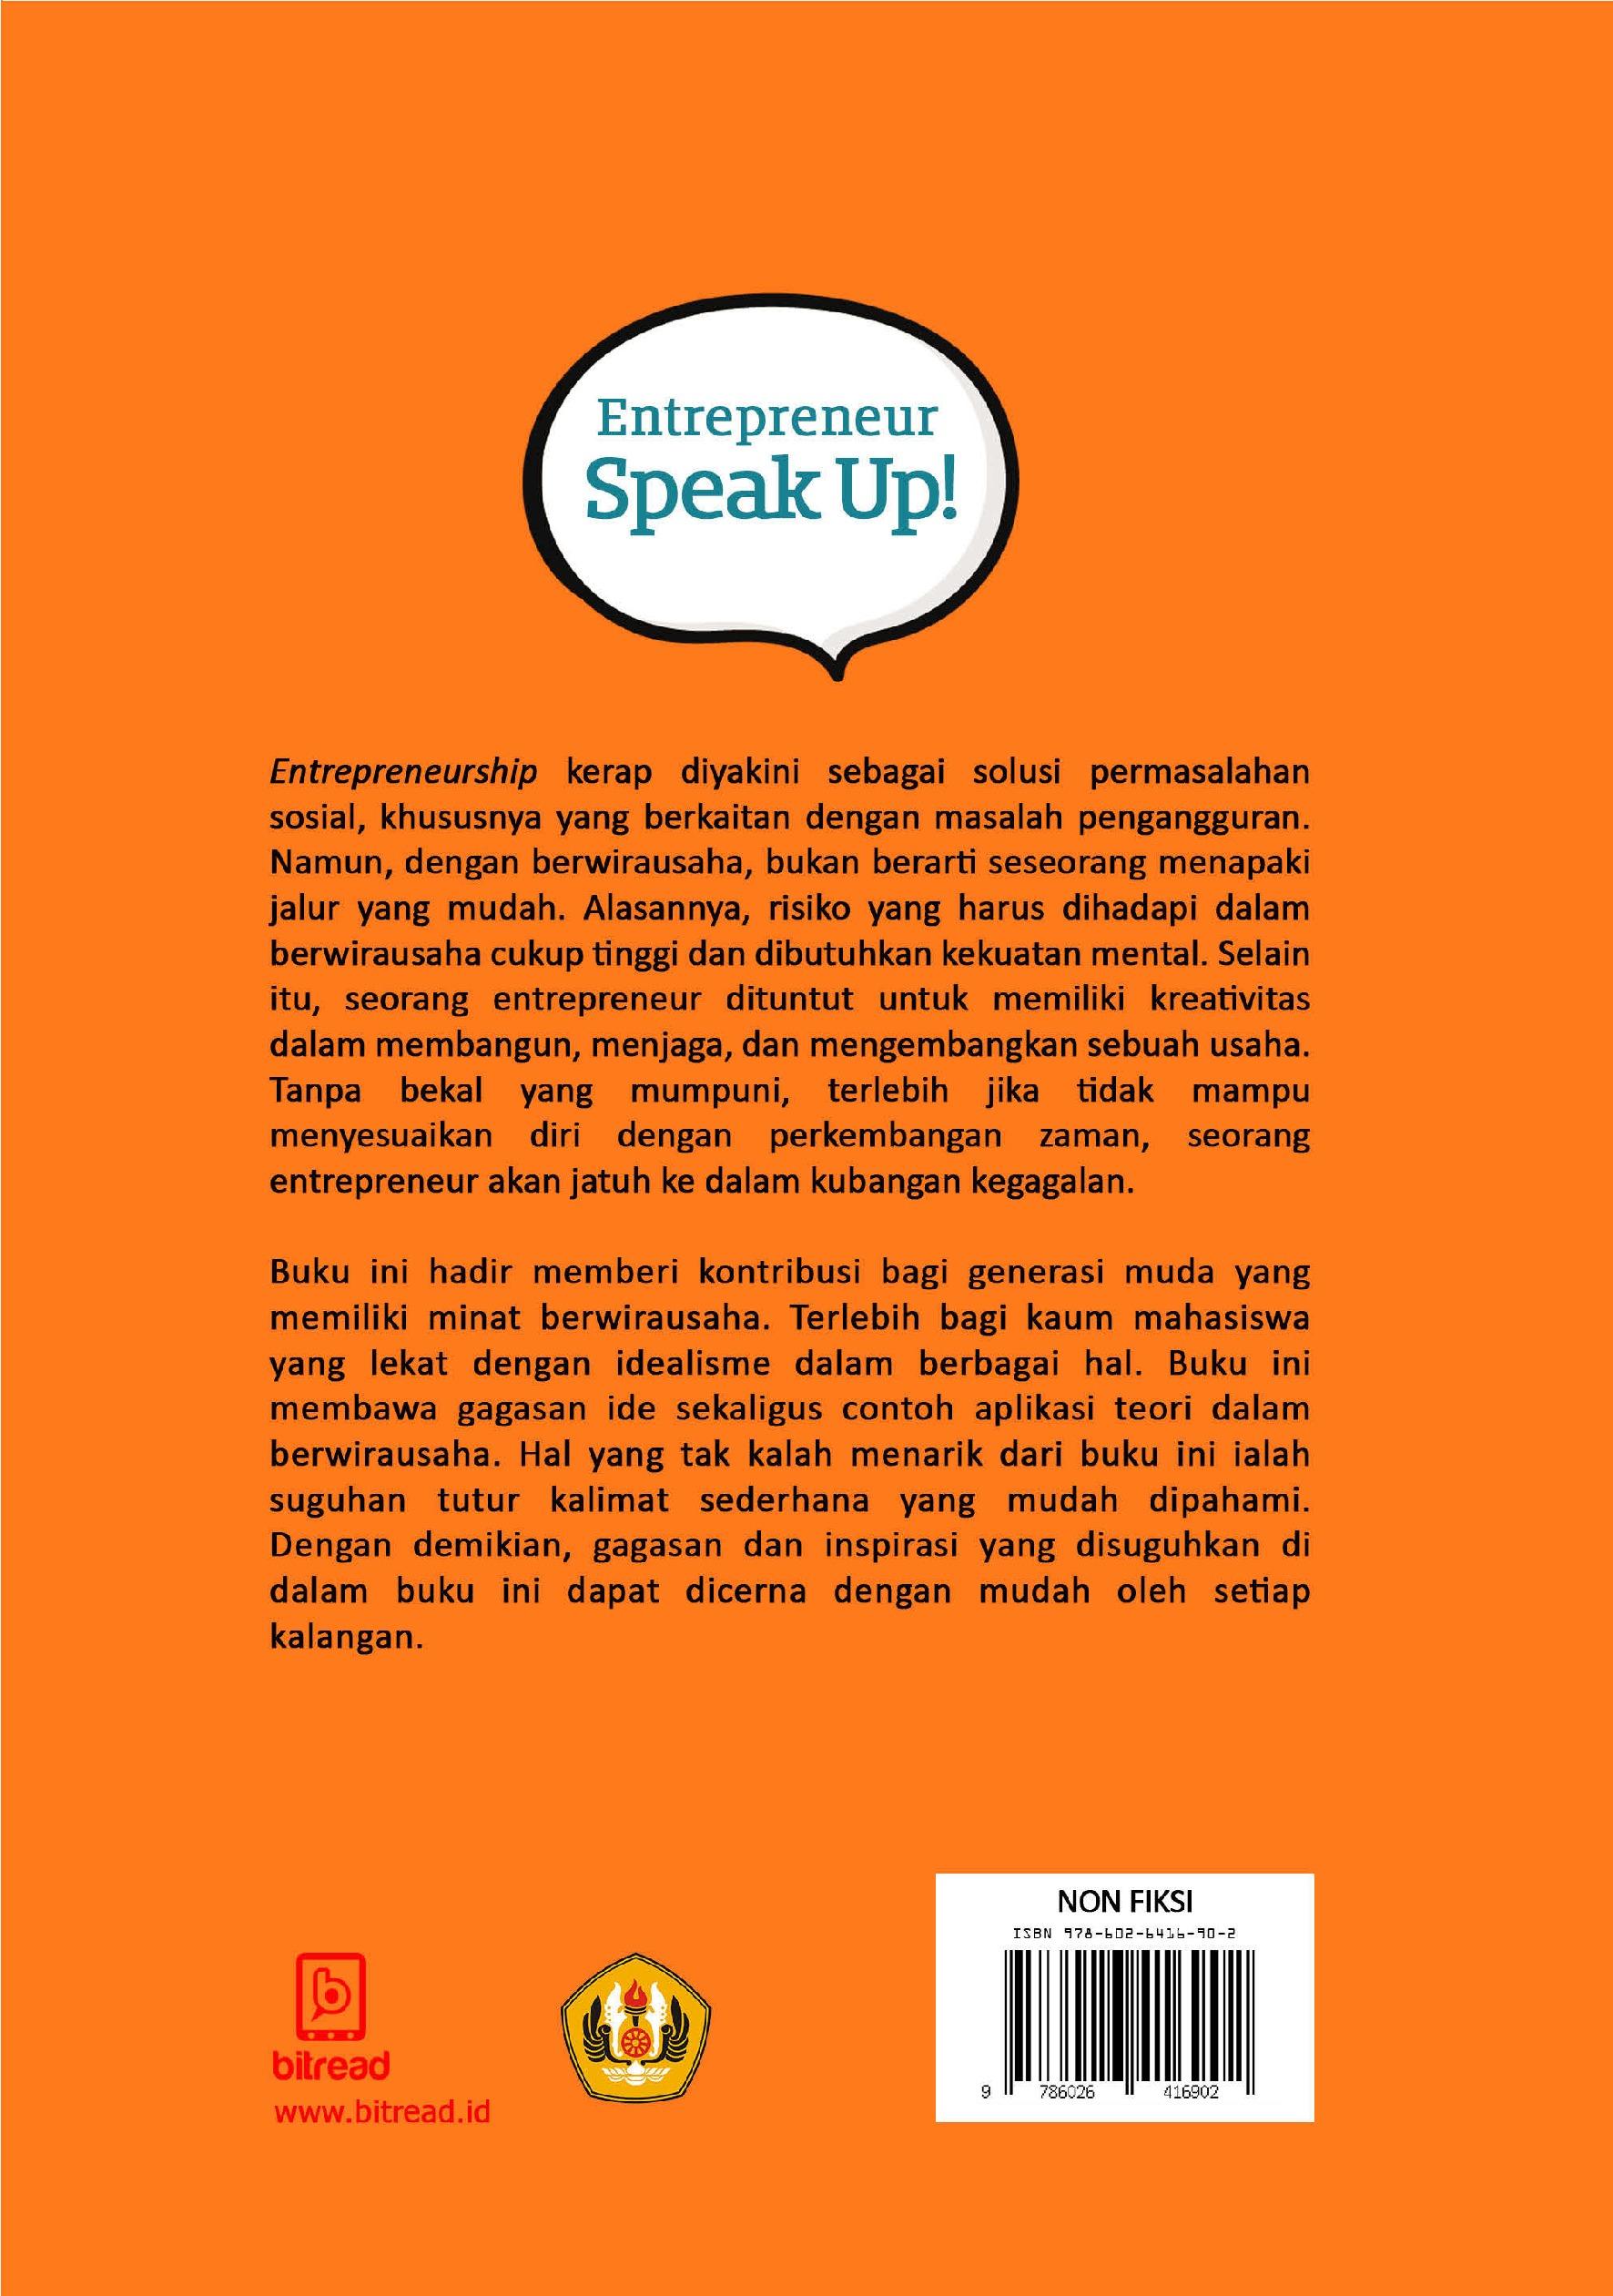 Entrepreneur Speak Up Book By Anas Bunyamin Gramedia Digital